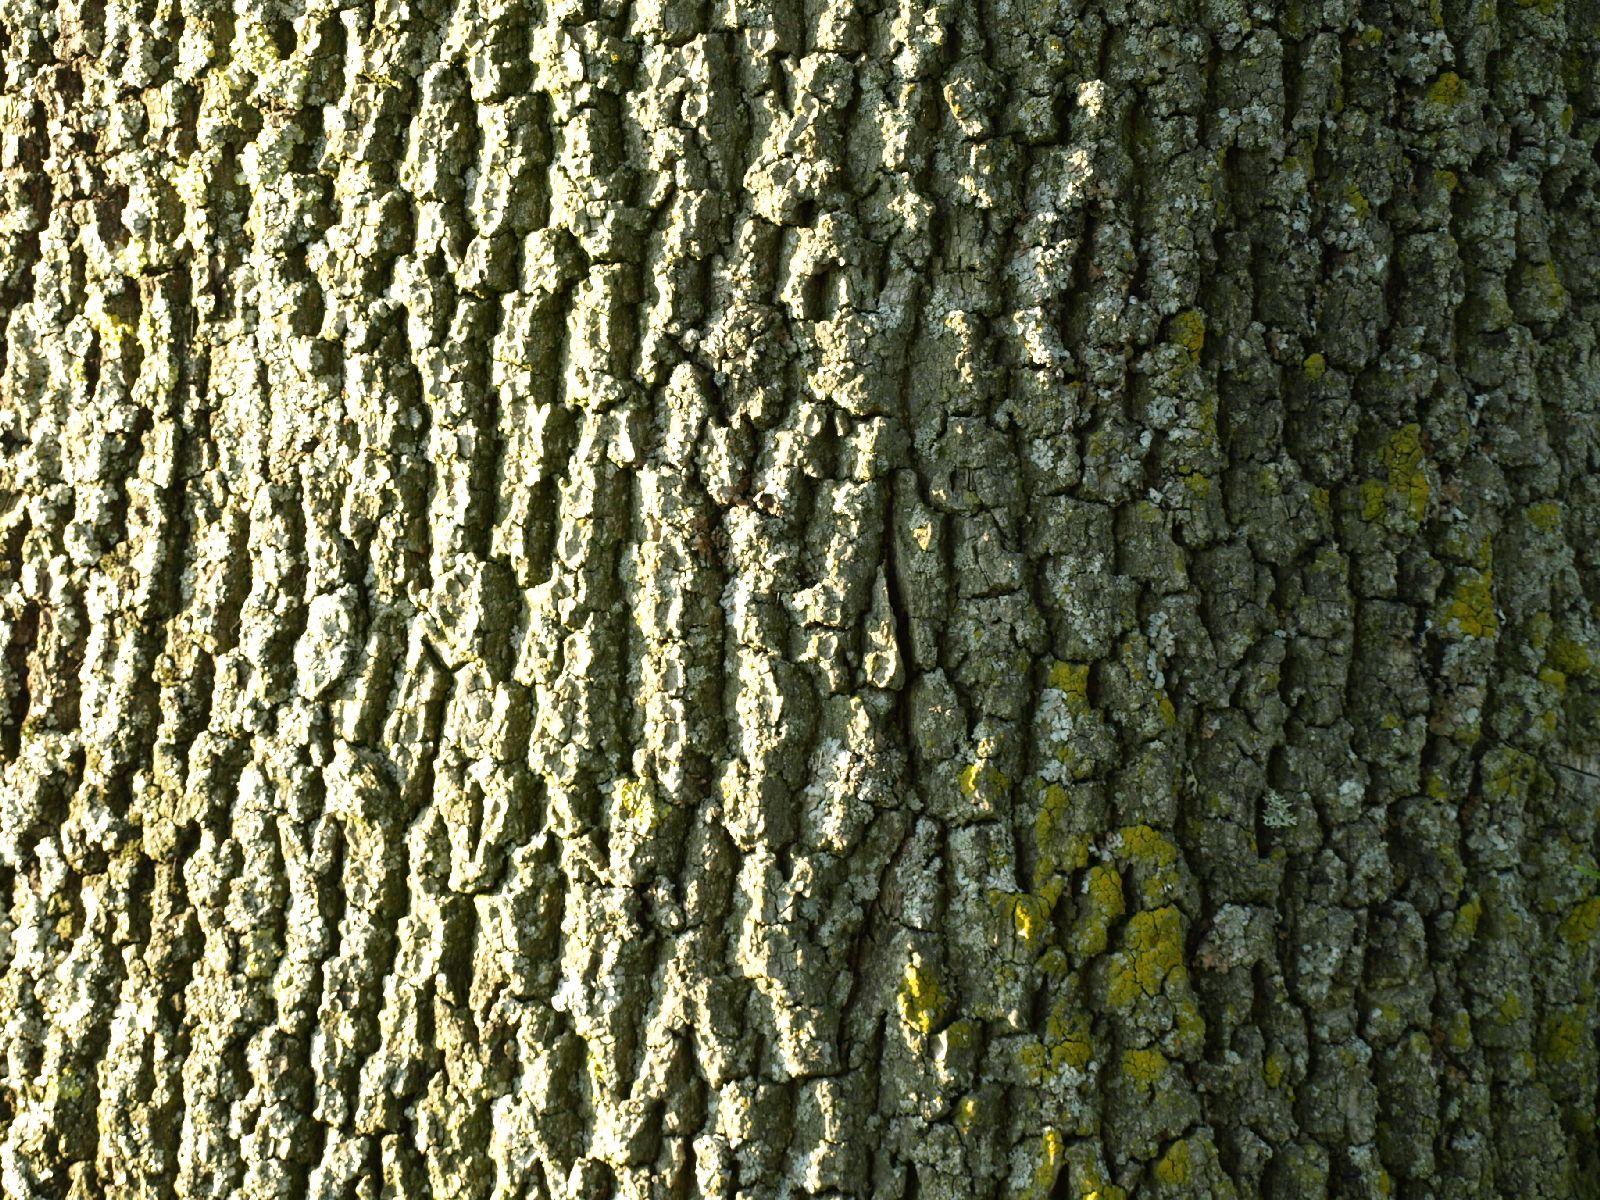 Baum-Rinde_Textur_A_P5122737